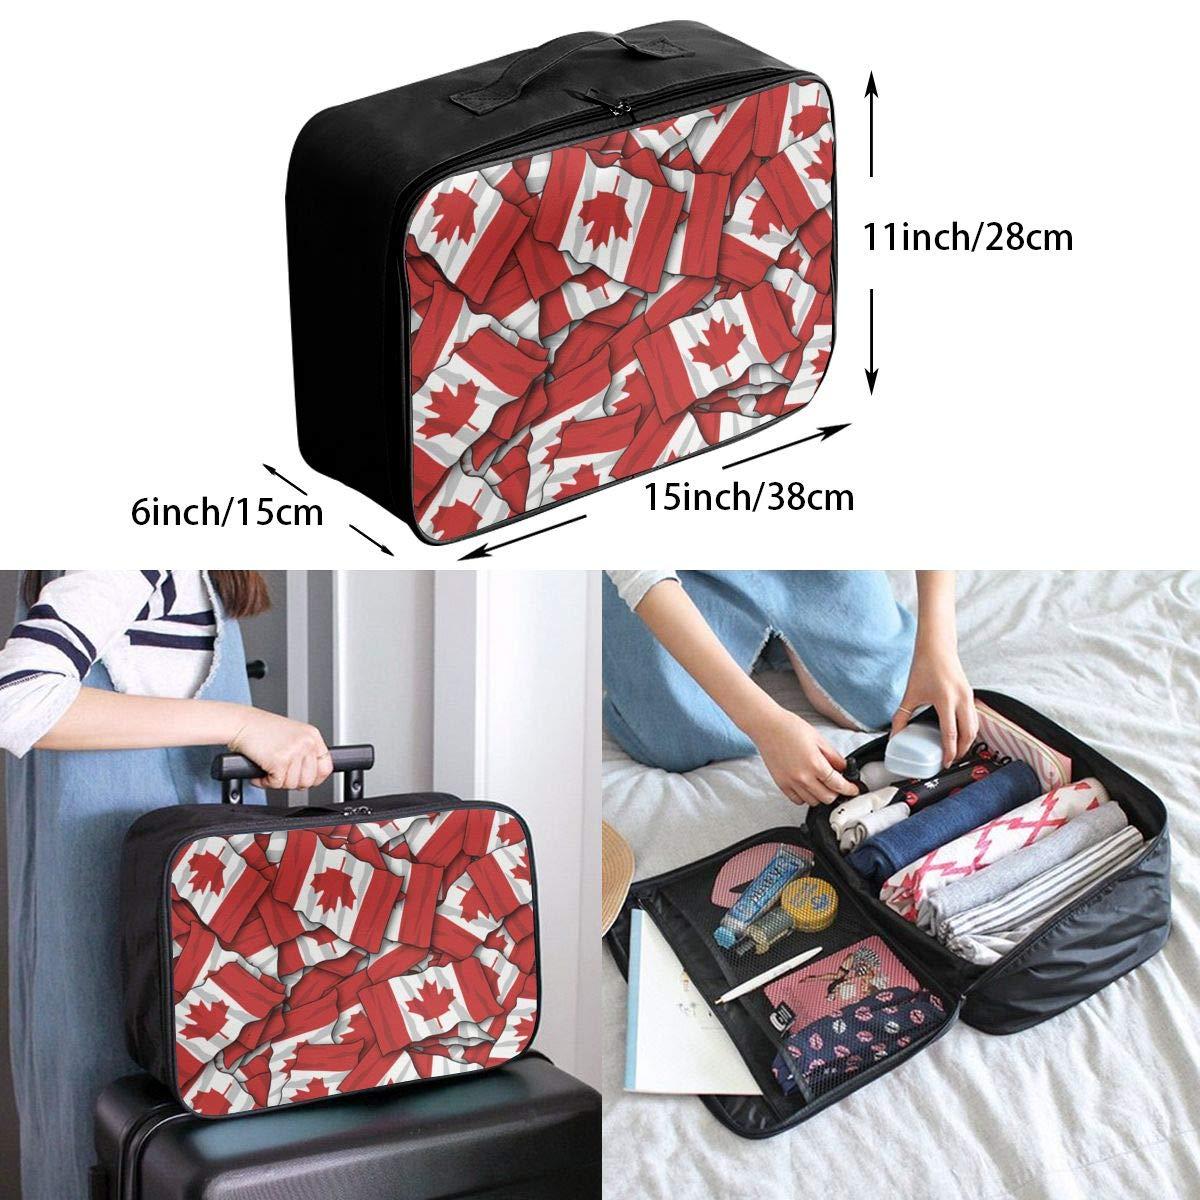 YueLJB Maple Canada Flag Lightweight Large Capacity Portable Luggage Bag Travel Duffel Bag Storage Carry Luggage Duffle Tote Bag